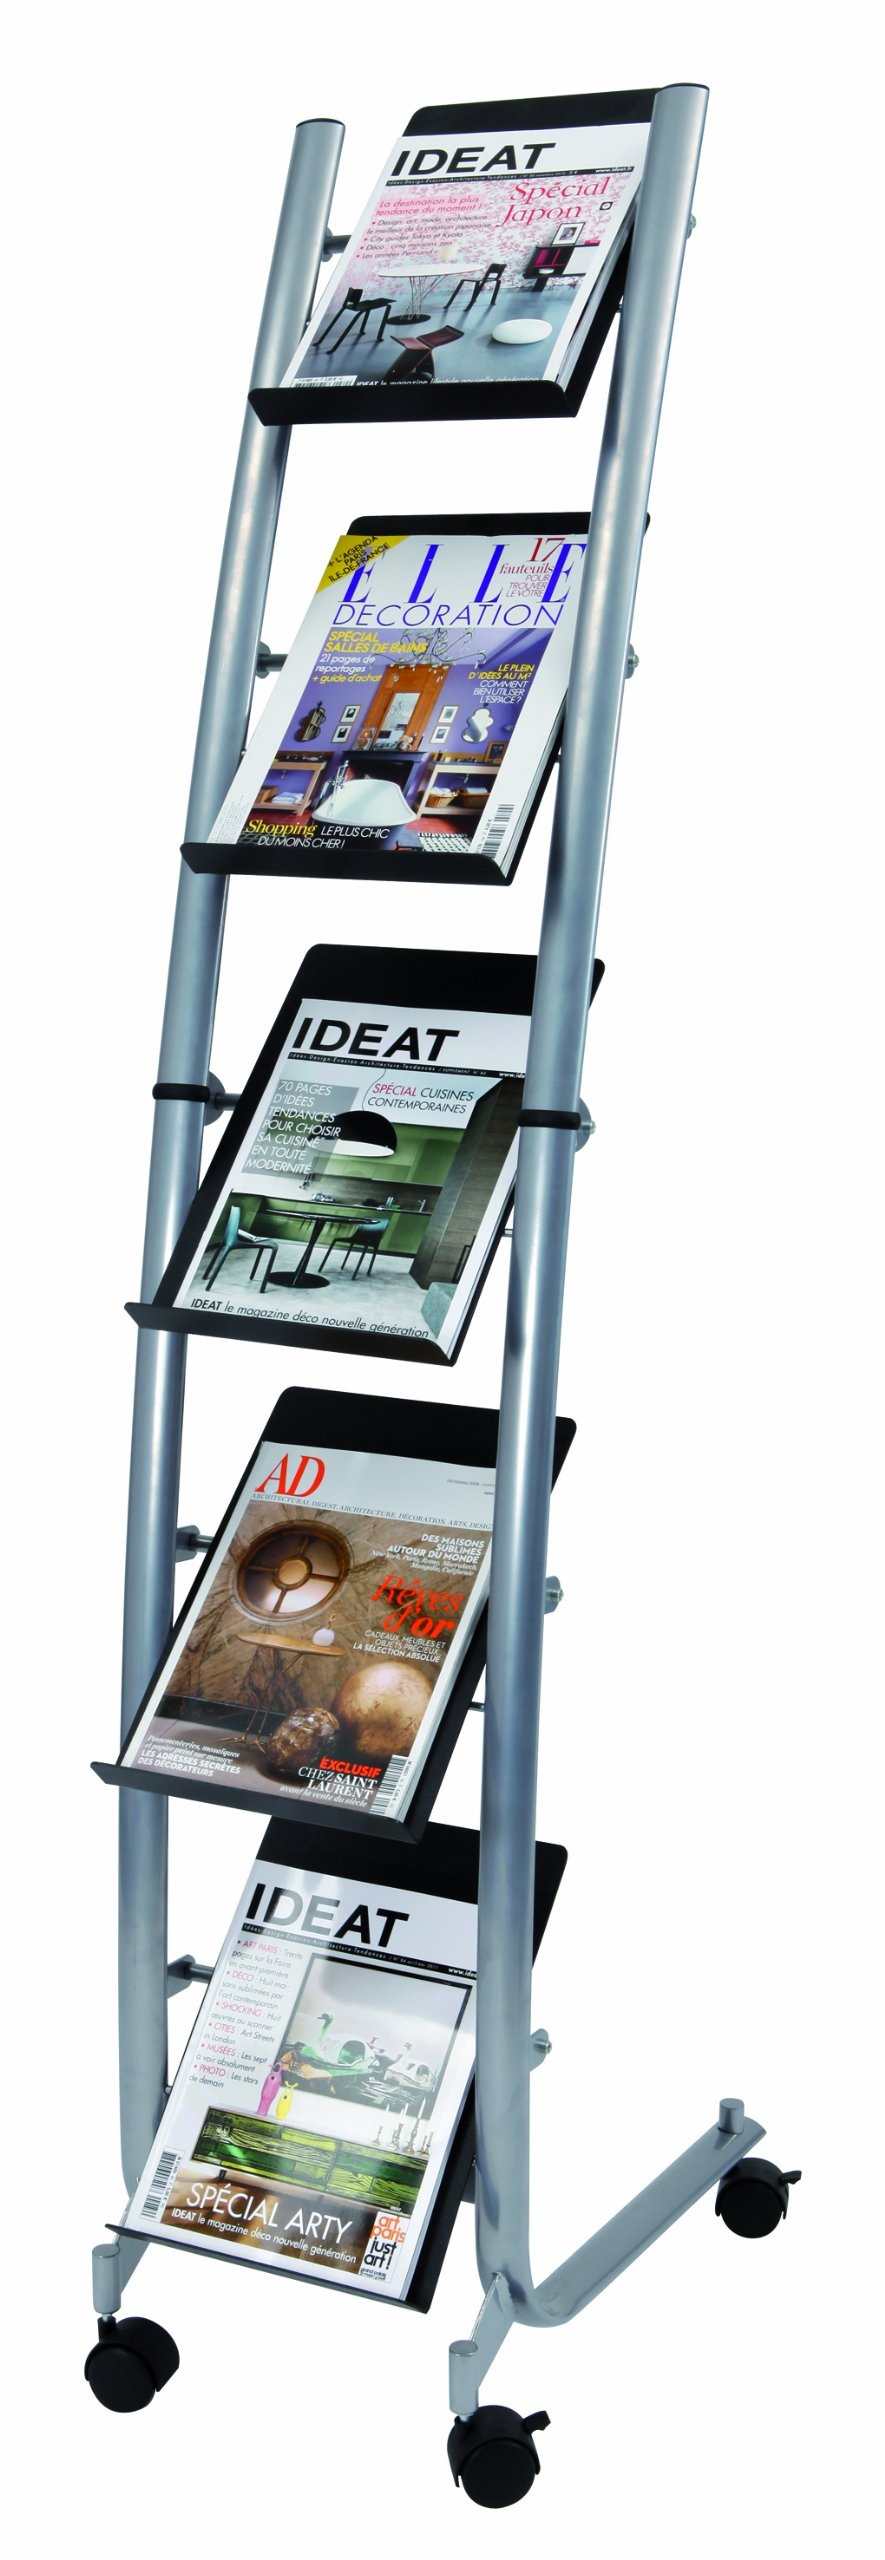 Alba Narrow Mobile Literature Display, 5 Levels, Metallic Gray and Black (DD5PM)